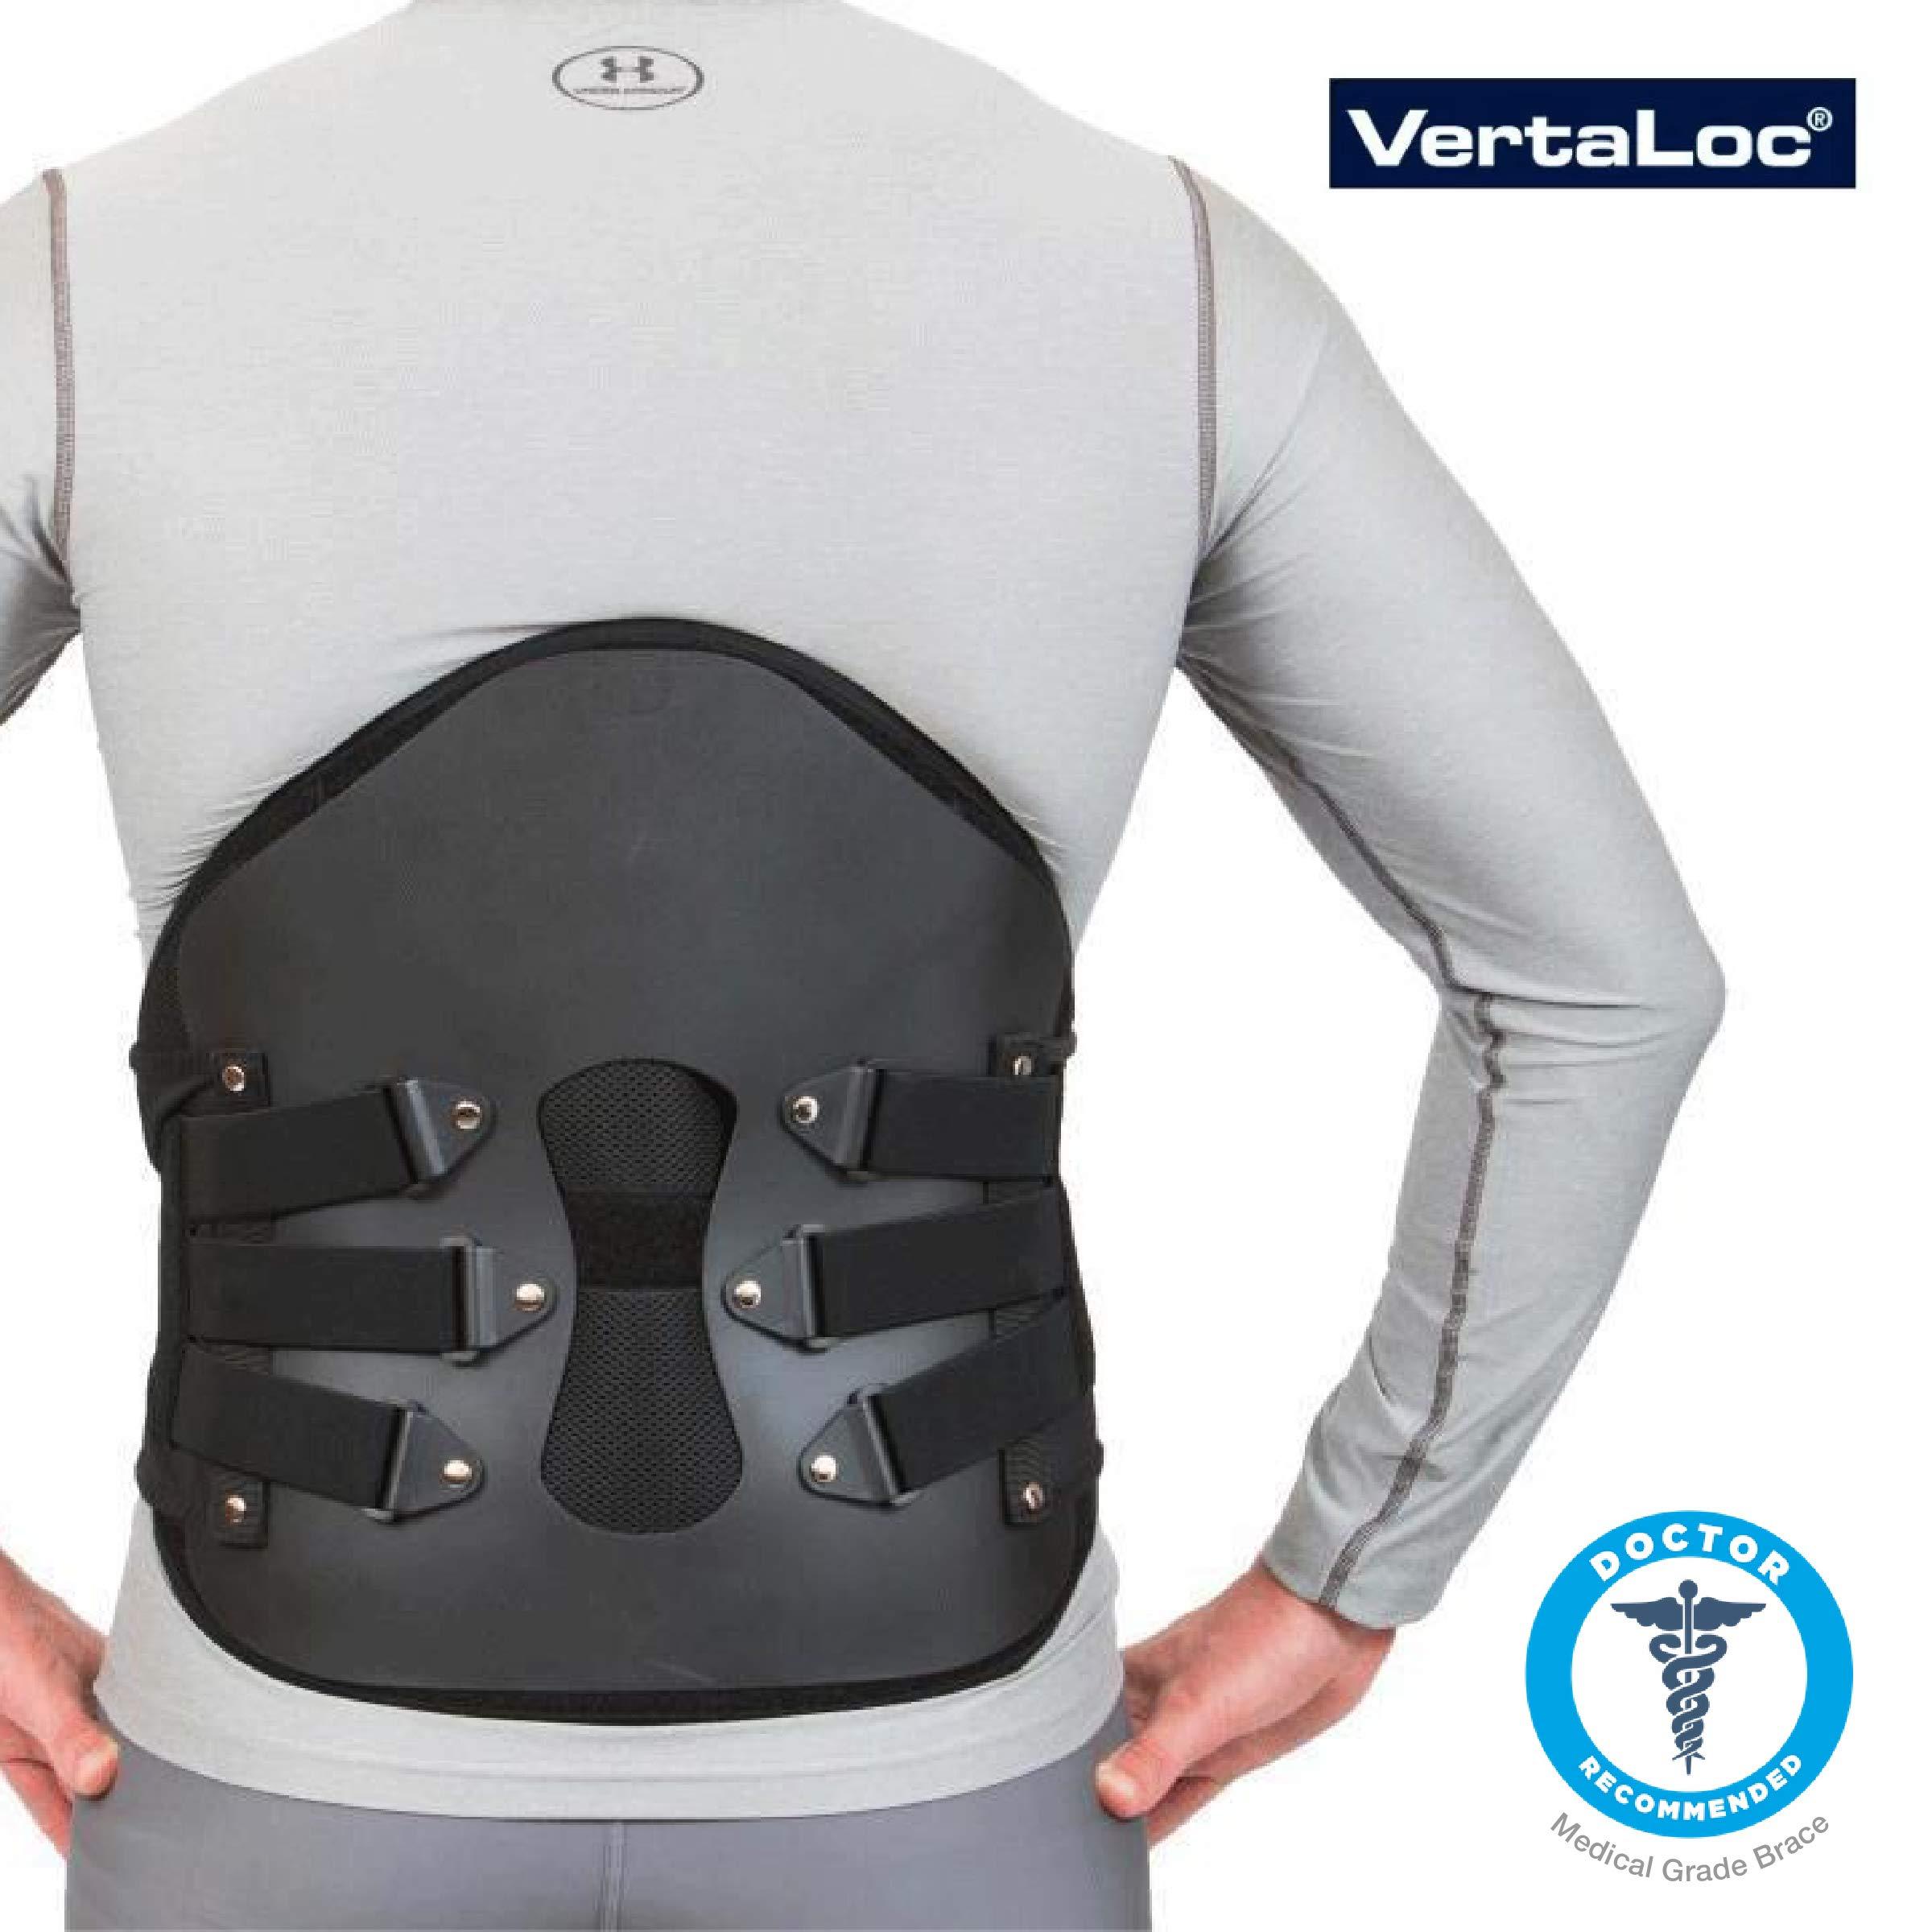 VertaLoc Pro Plus Medical Grade Back Brace and Support for Lower Back Pain by VERTALOC, INC. (Image #1)